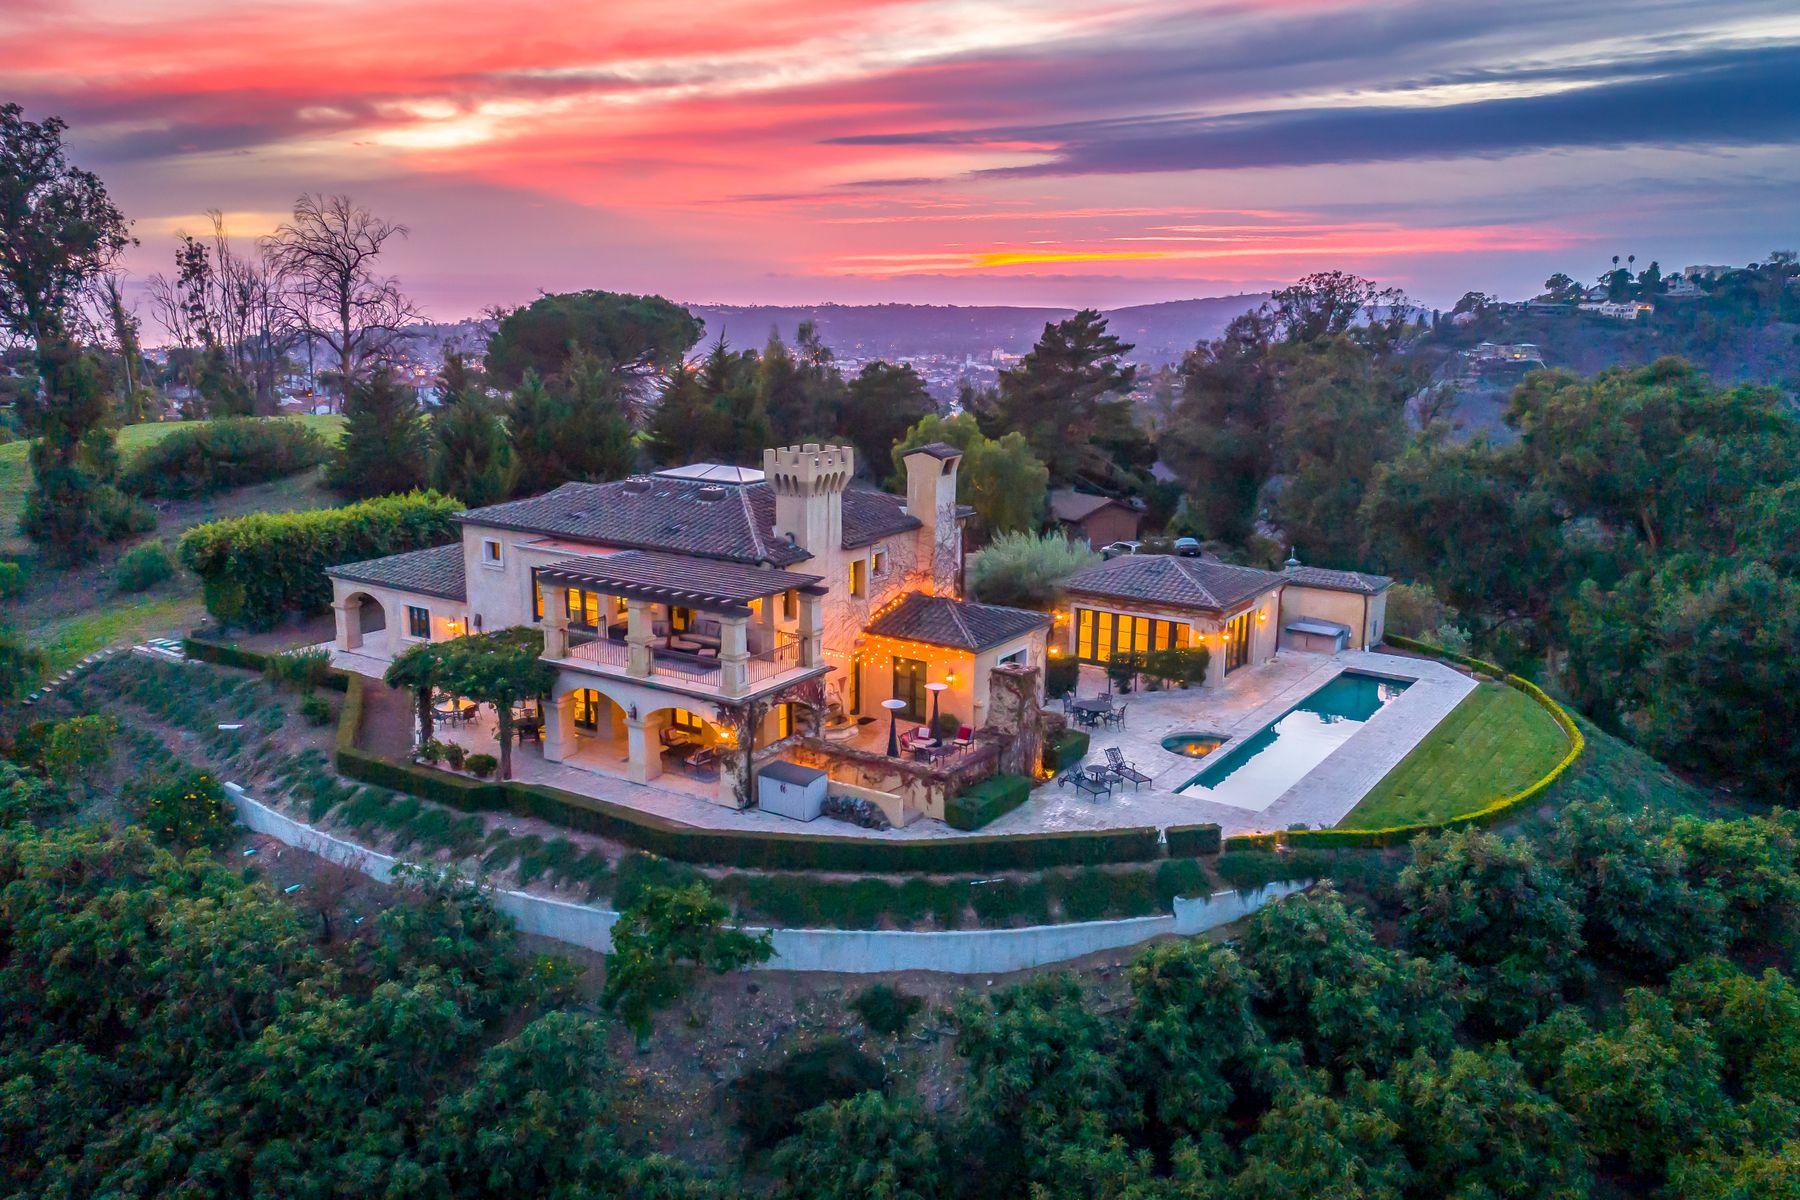 Single Family Homes for Sale at Tuscan Inspired Montecito Estate 117 Crestview Ln Santa Barbara, California 93108 United States